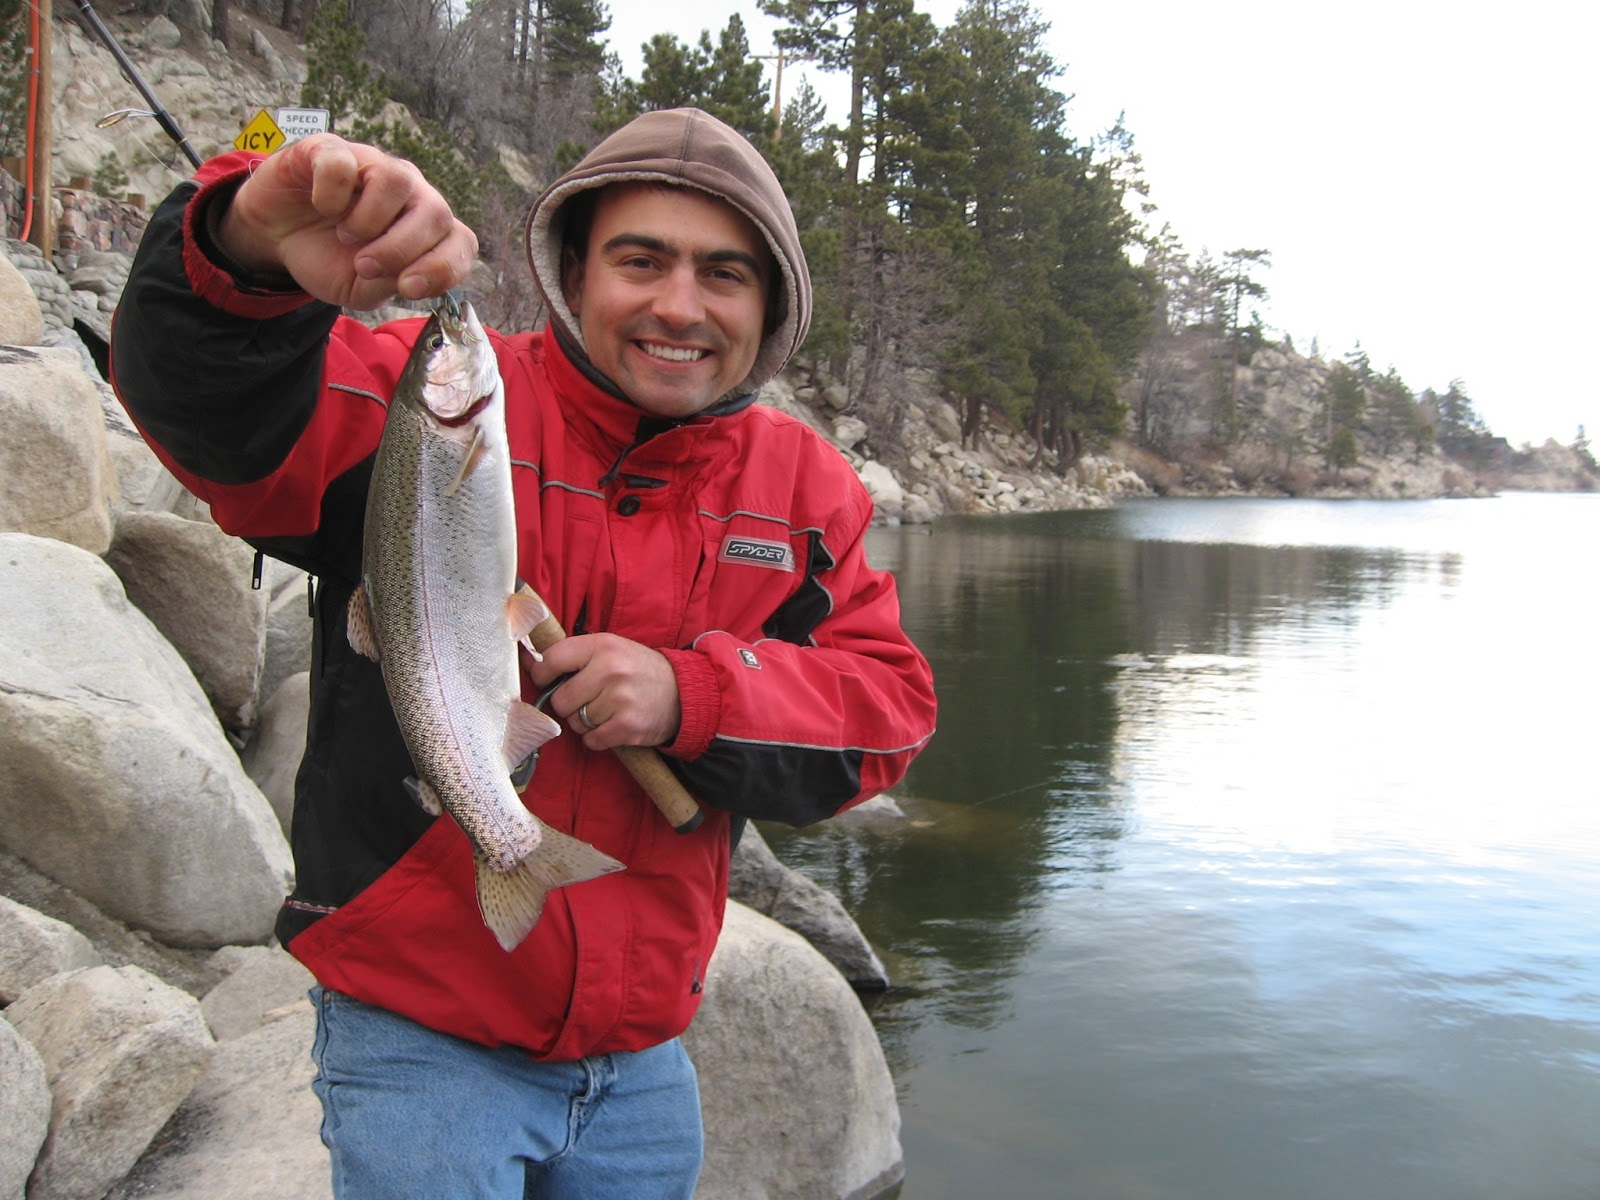 Big bear lake mini jigs for rainbow trout april for Big fish lake